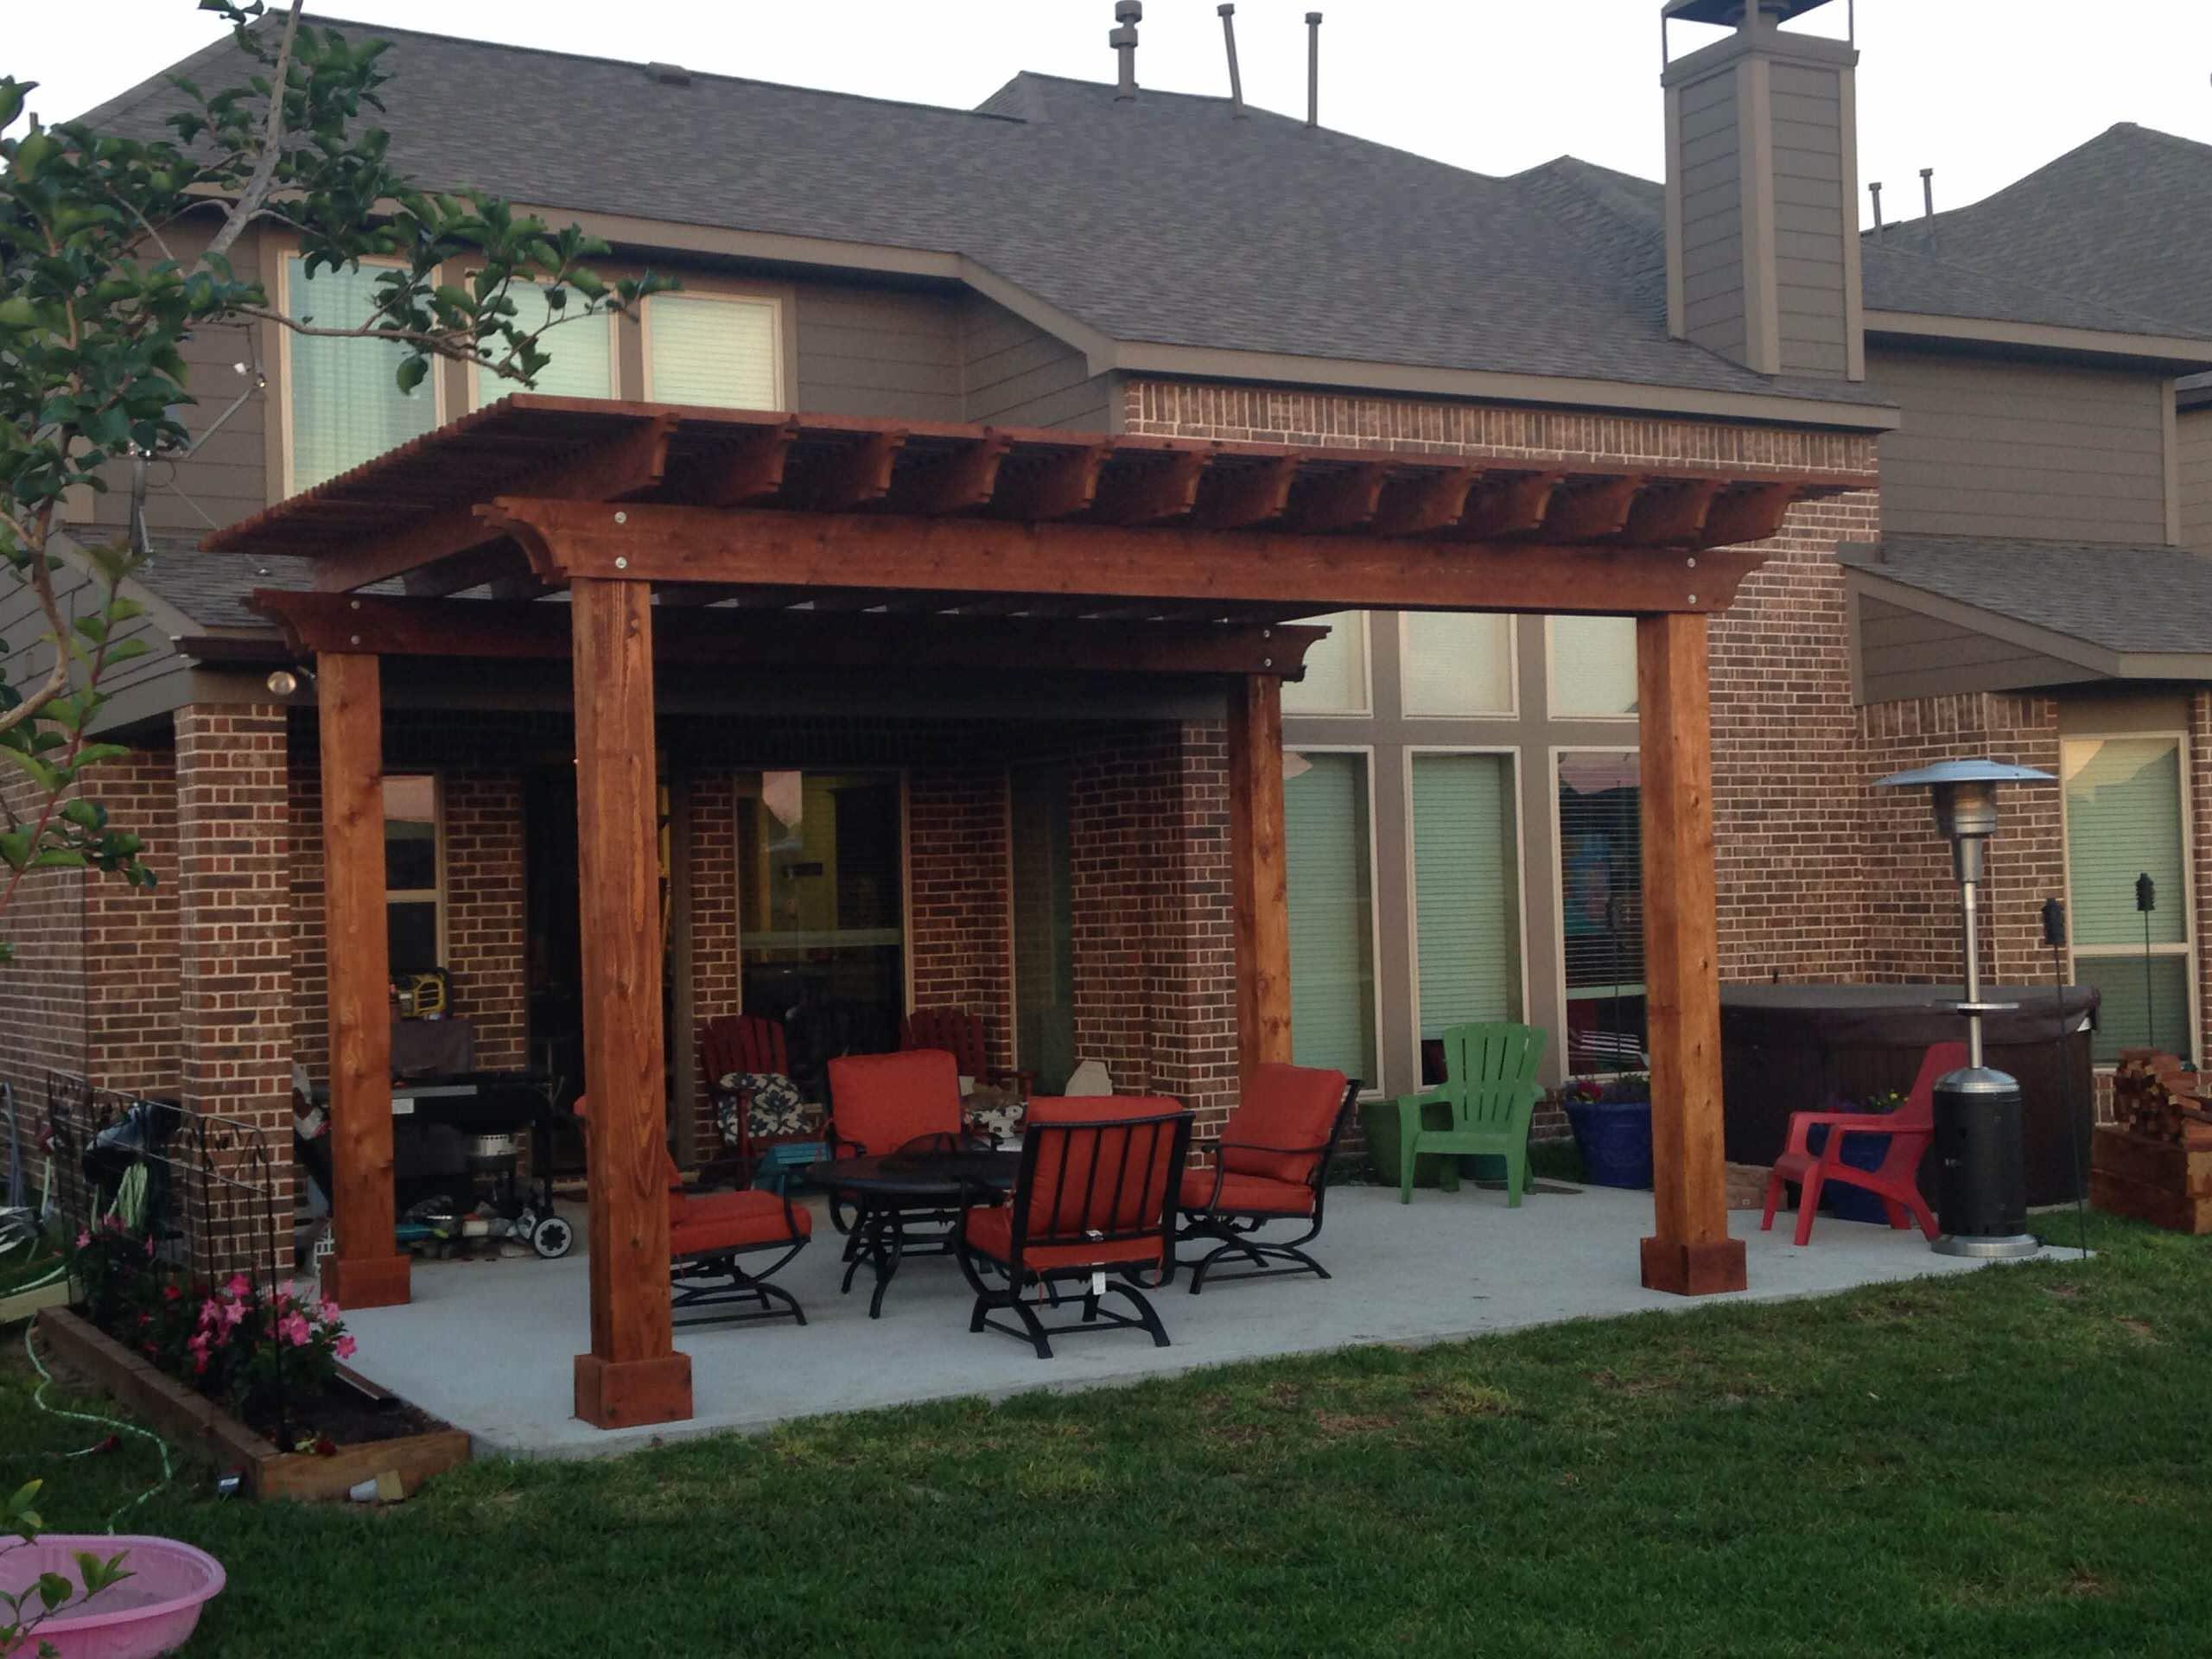 18 x 18 patio ideas photos houzz